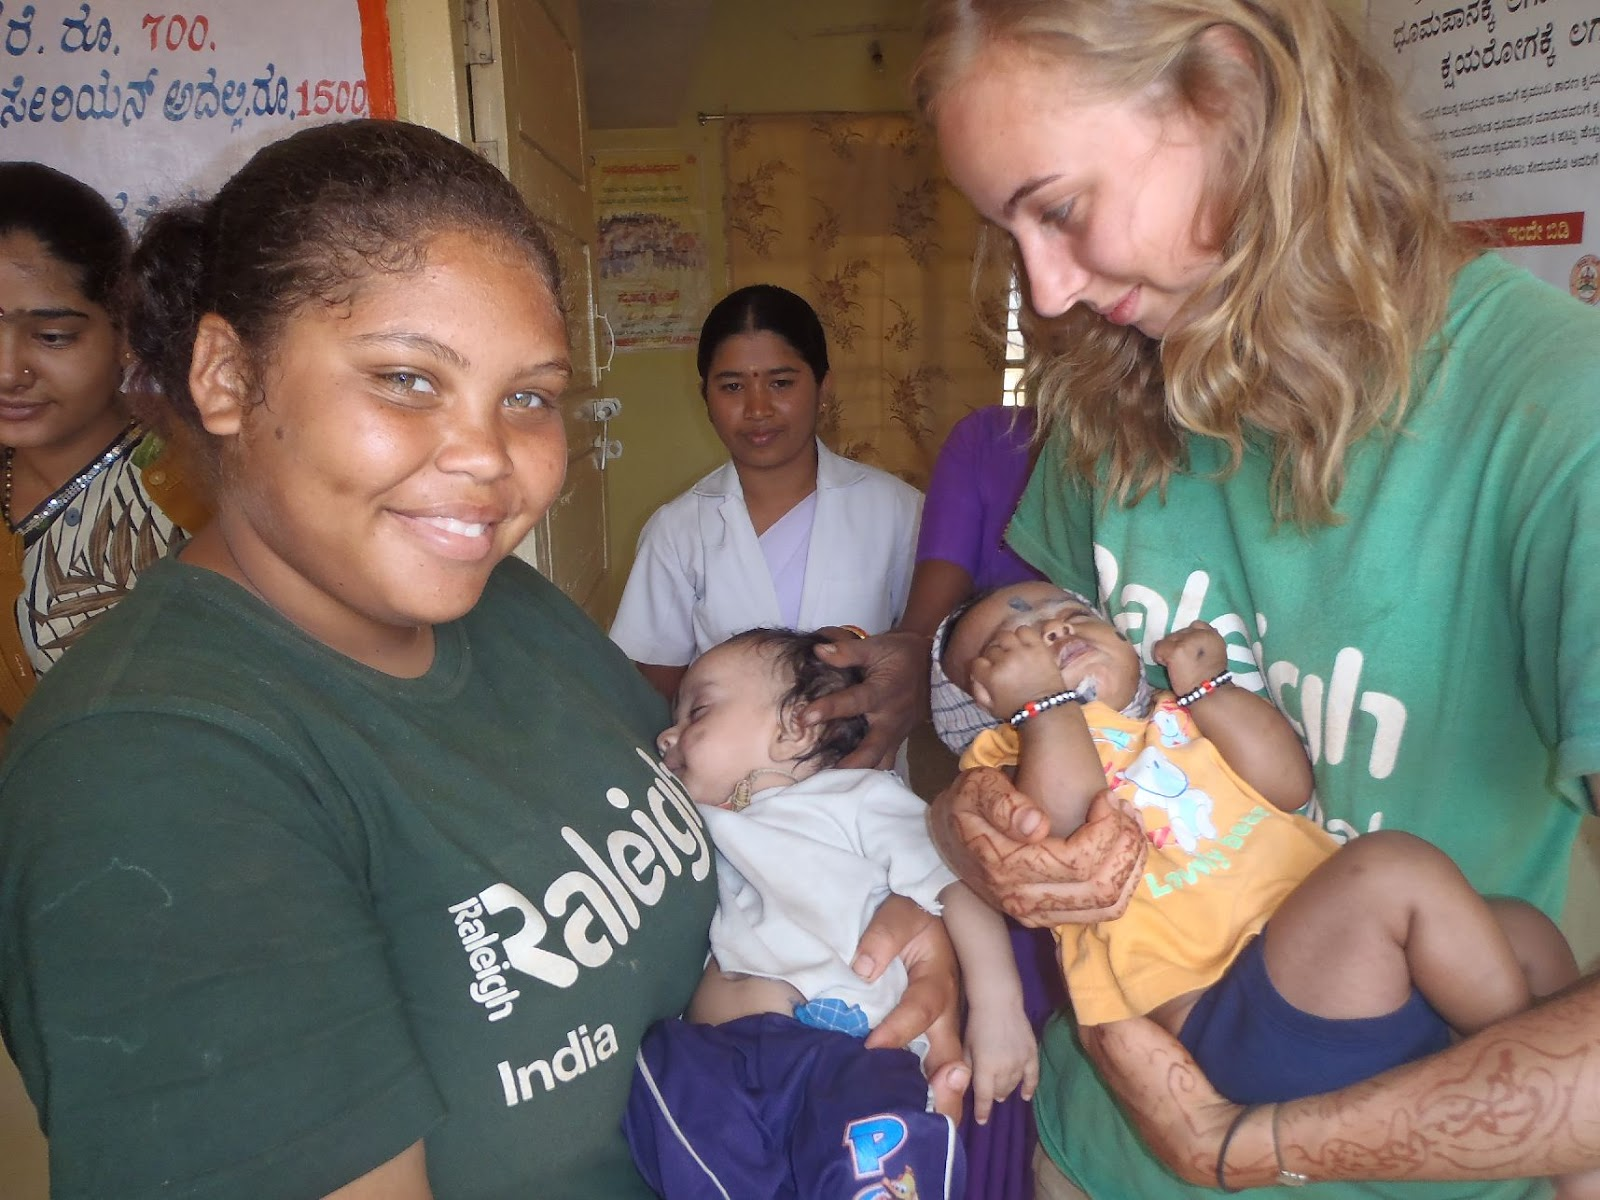 http://1.bp.blogspot.com/-V3jCSeYe0CU/T2cPmQCyfUI/AAAAAAAARY0/ymsmrcDidwY/s1600/image091SMALL+chyna+charlotte+babies.jpg